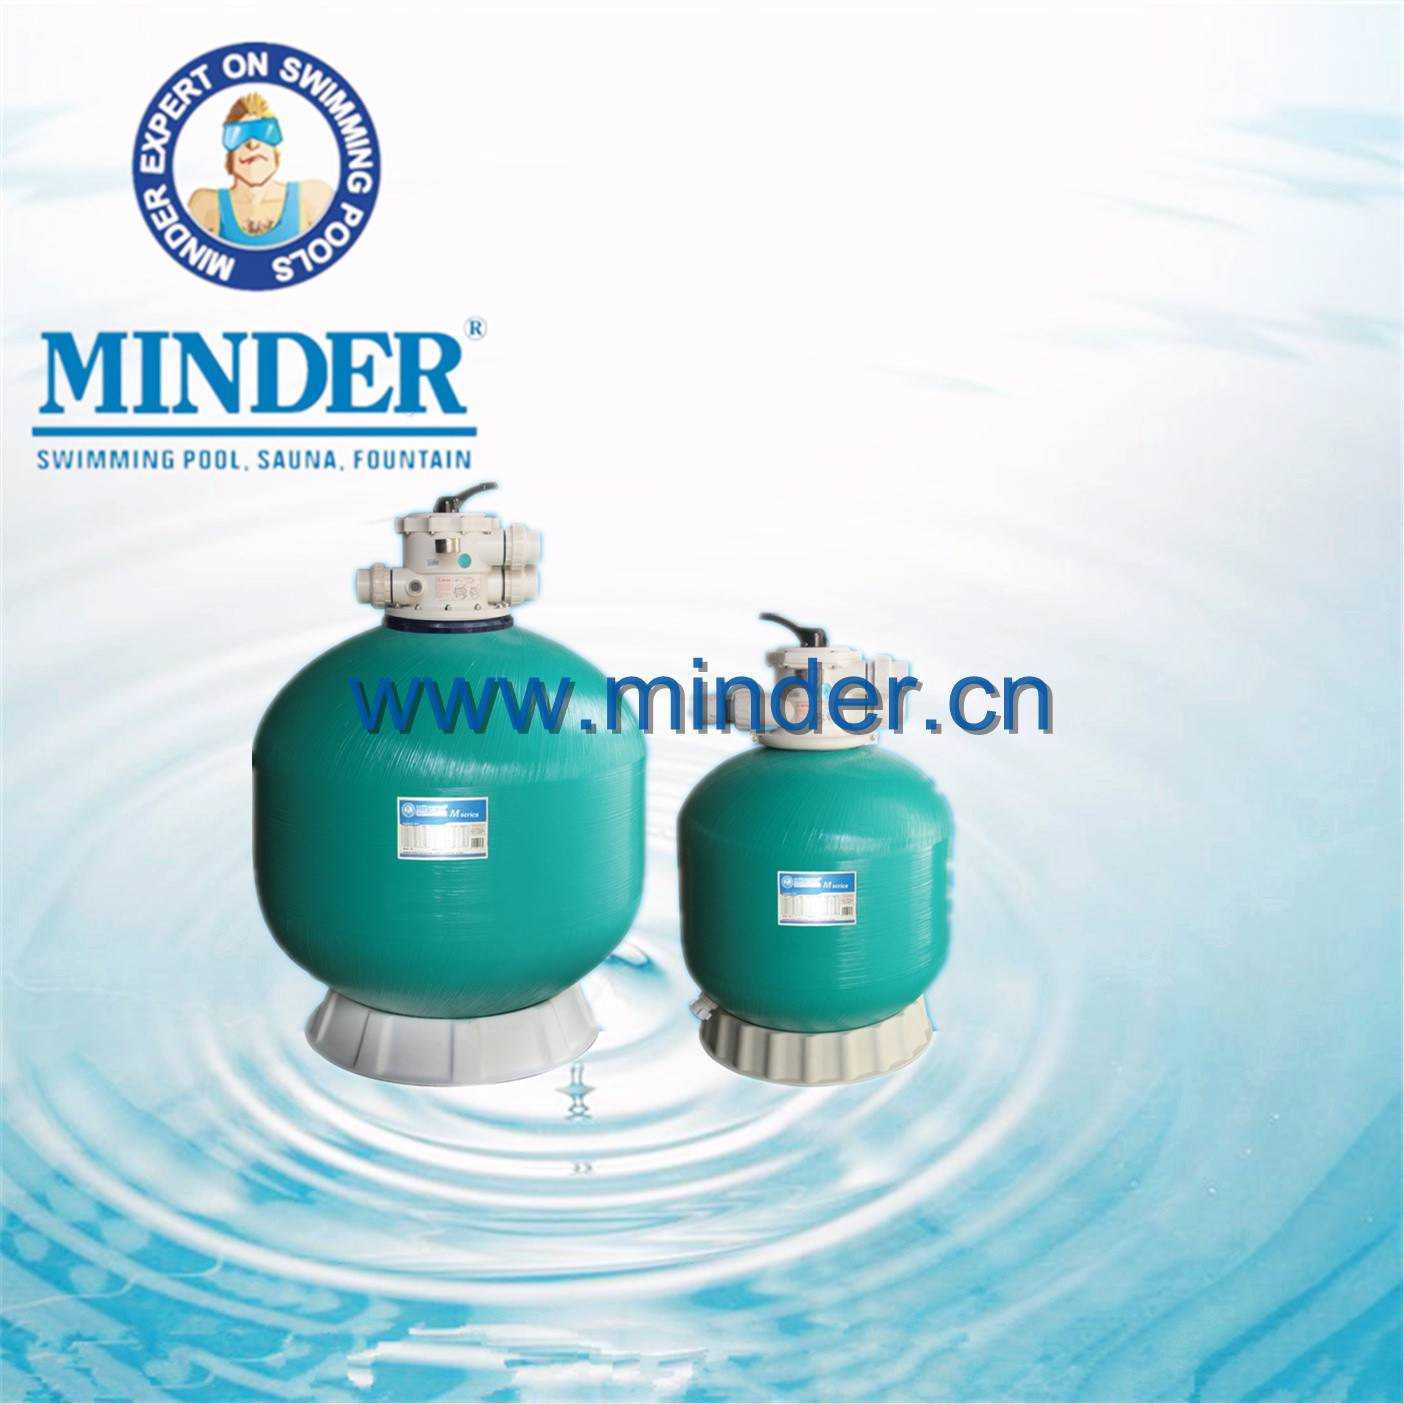 Firberglass 1.5 inch Valve Swimming Pool Sand Filter